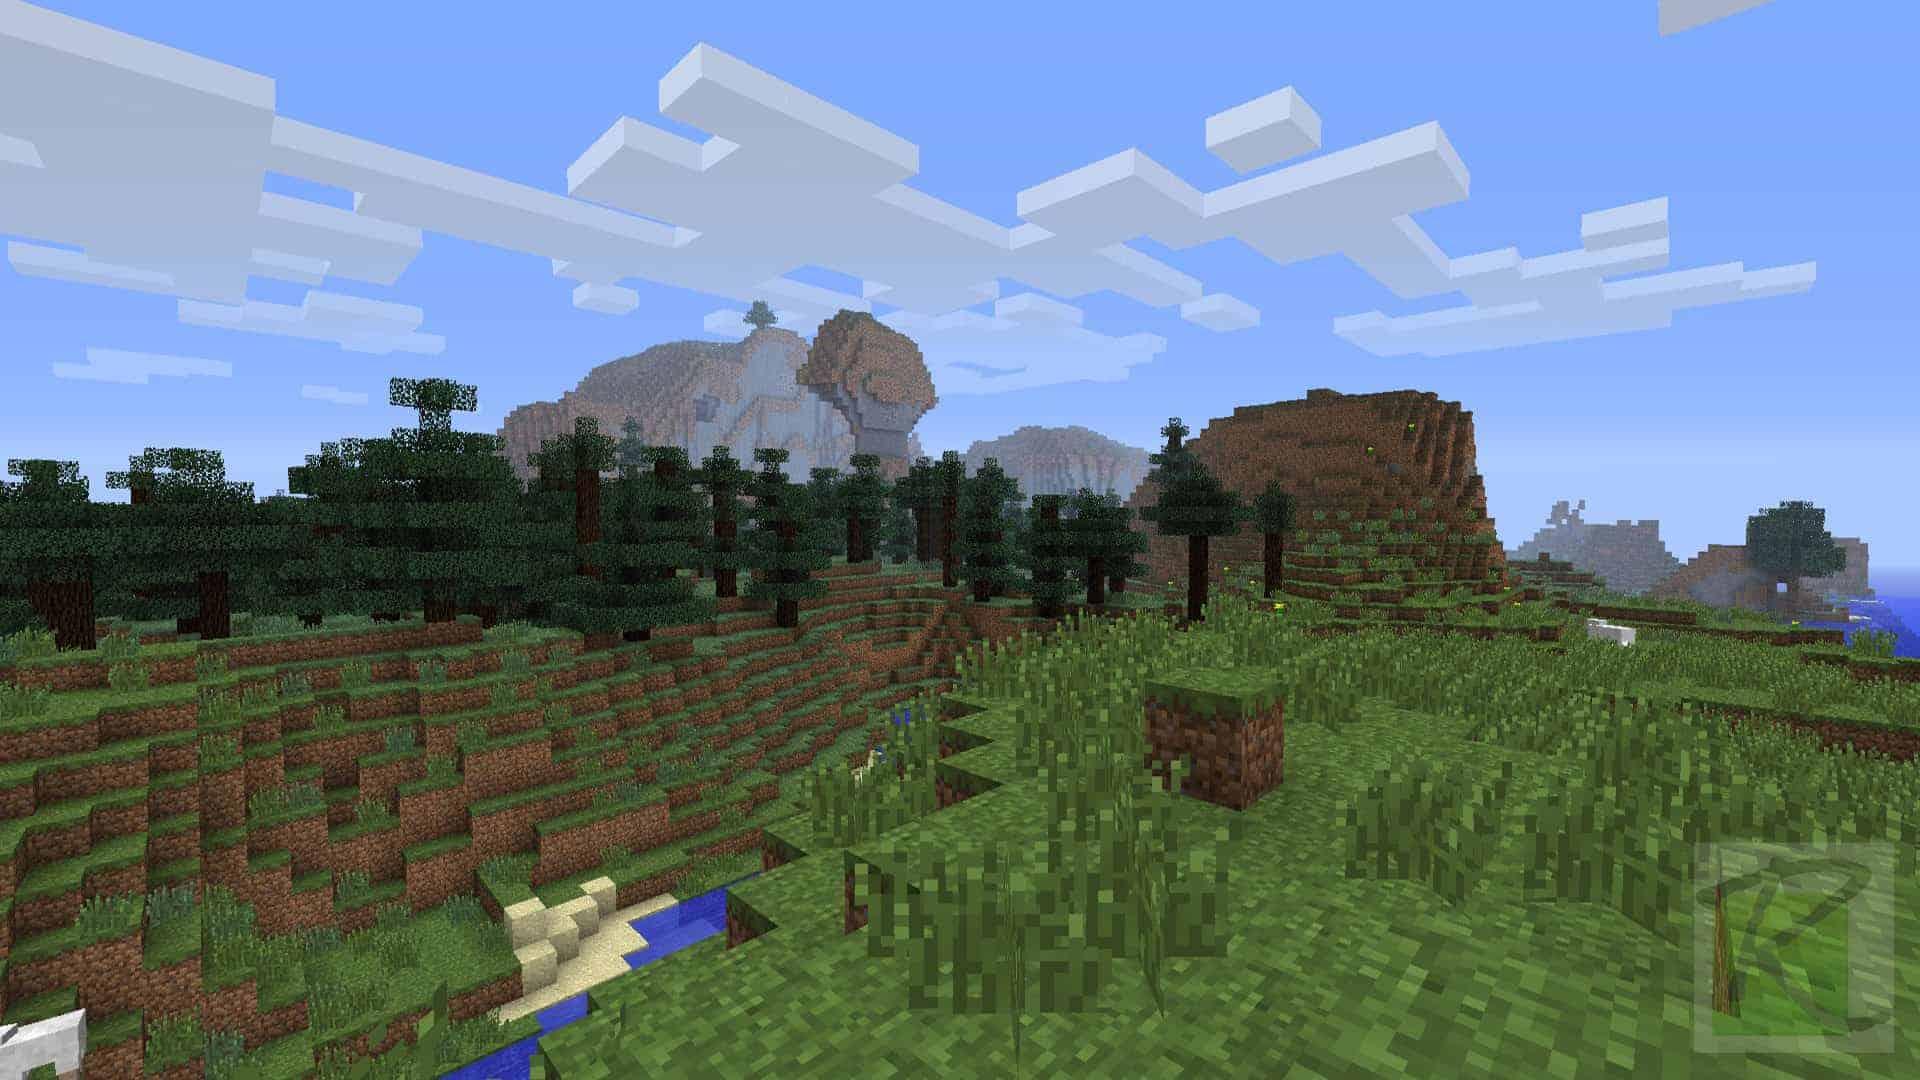 minecraft free download full version no lag